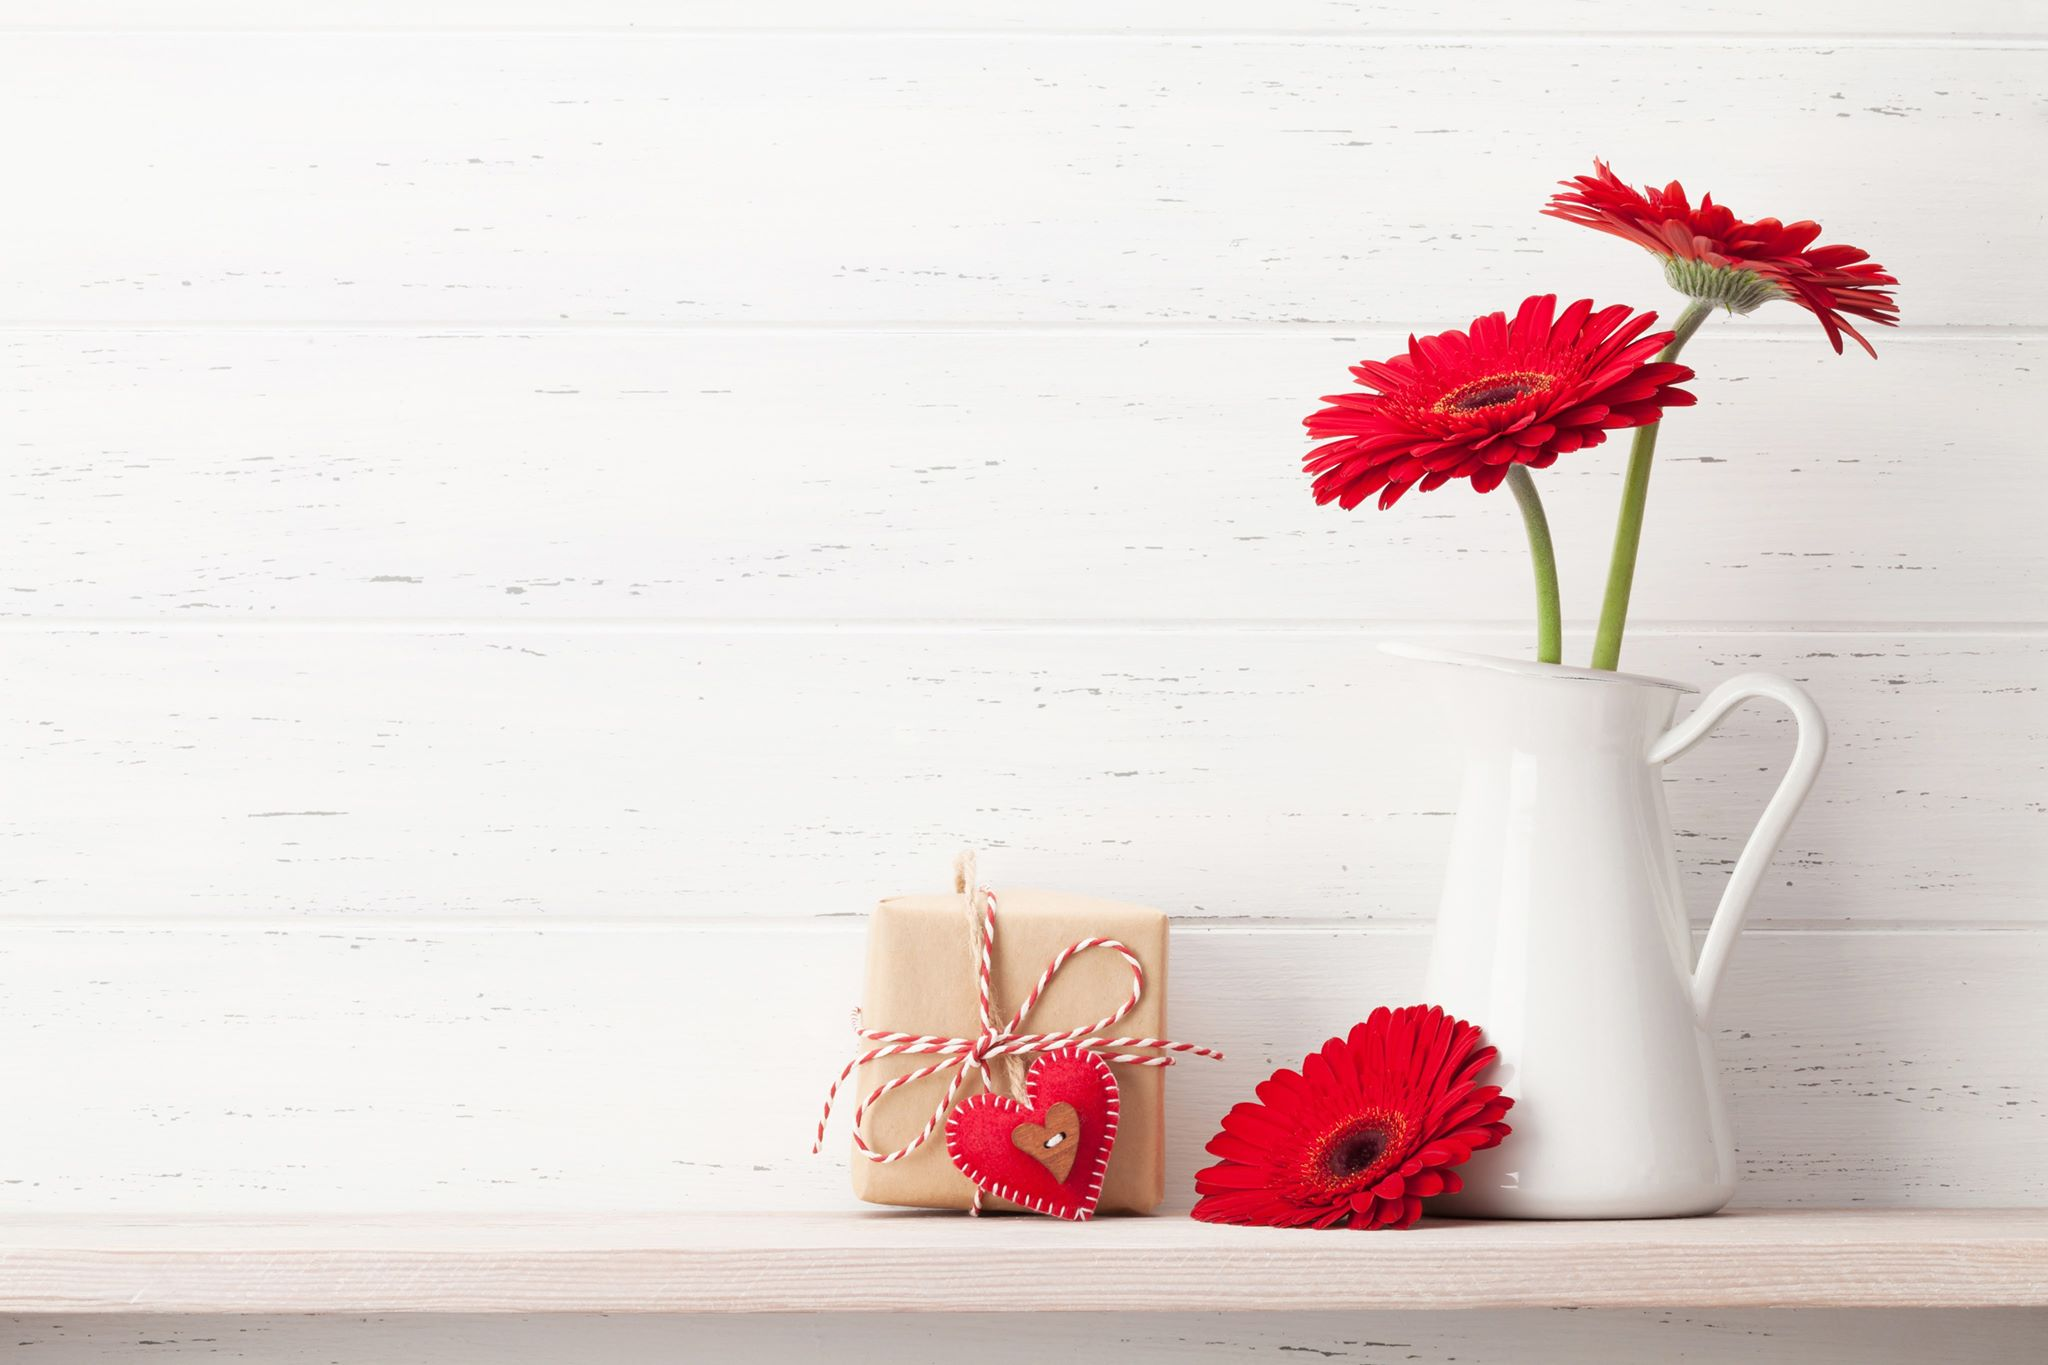 Valentines day images 26 صور عيد الحب